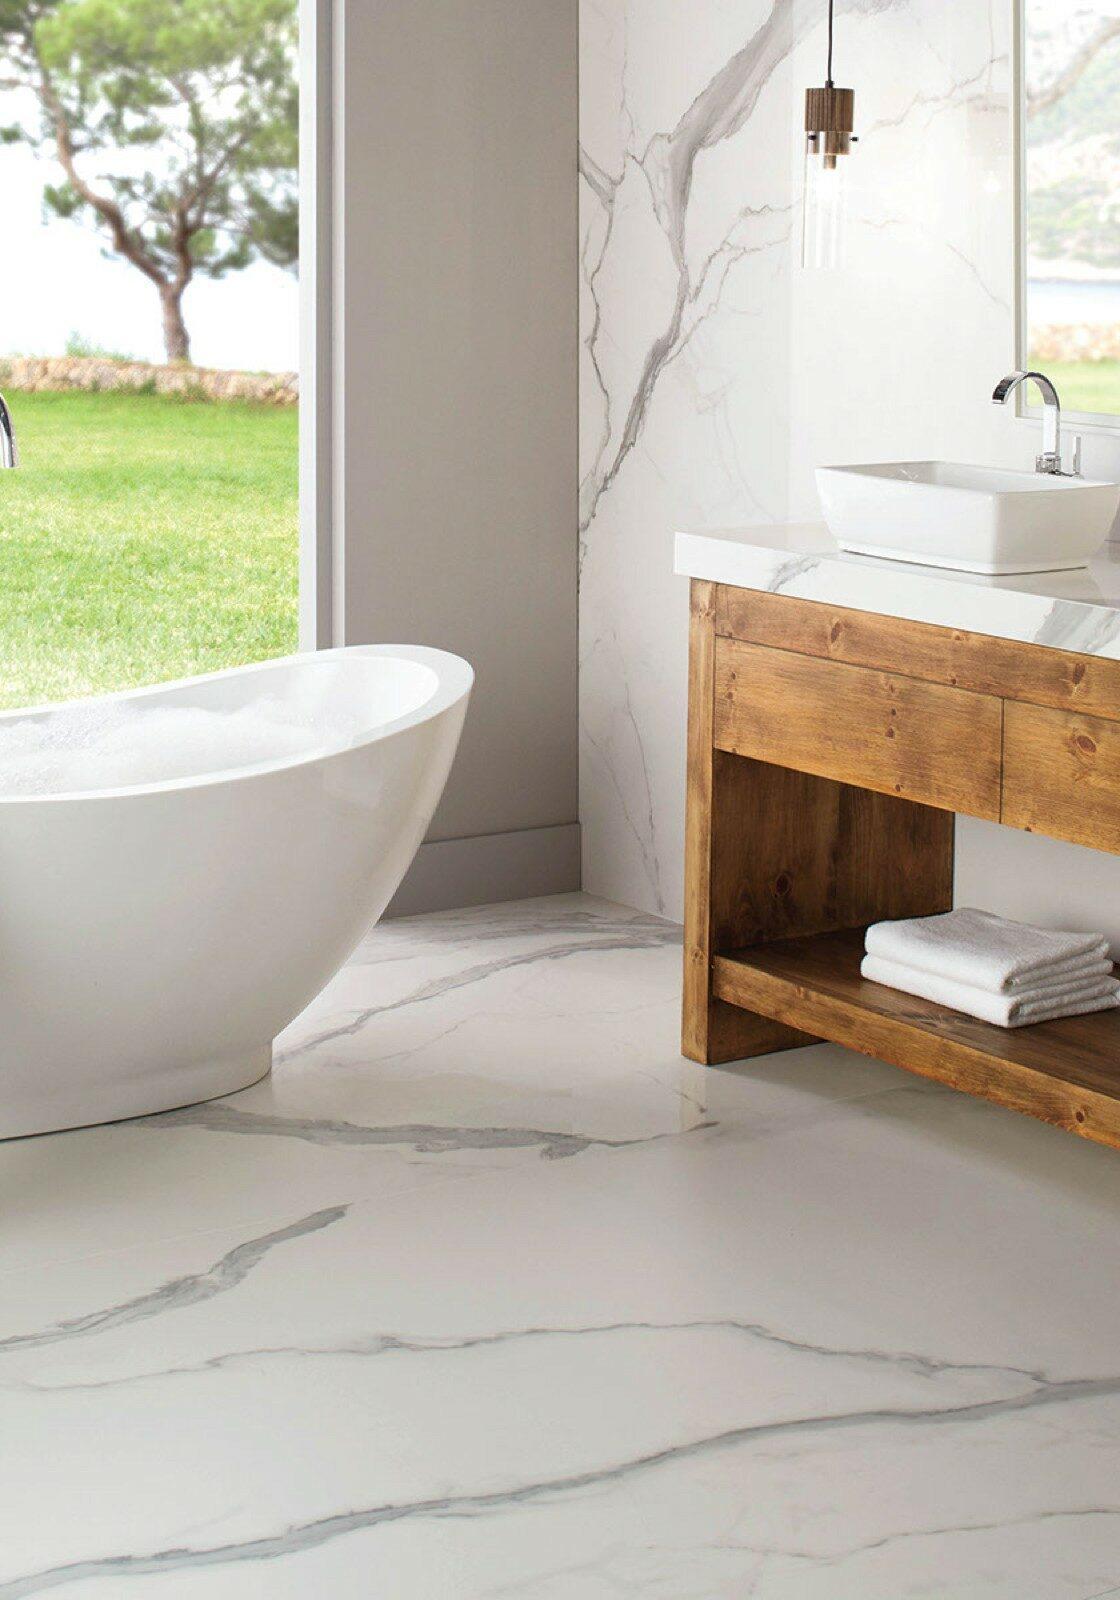 daltile tile in bathroom | Gilman Floors